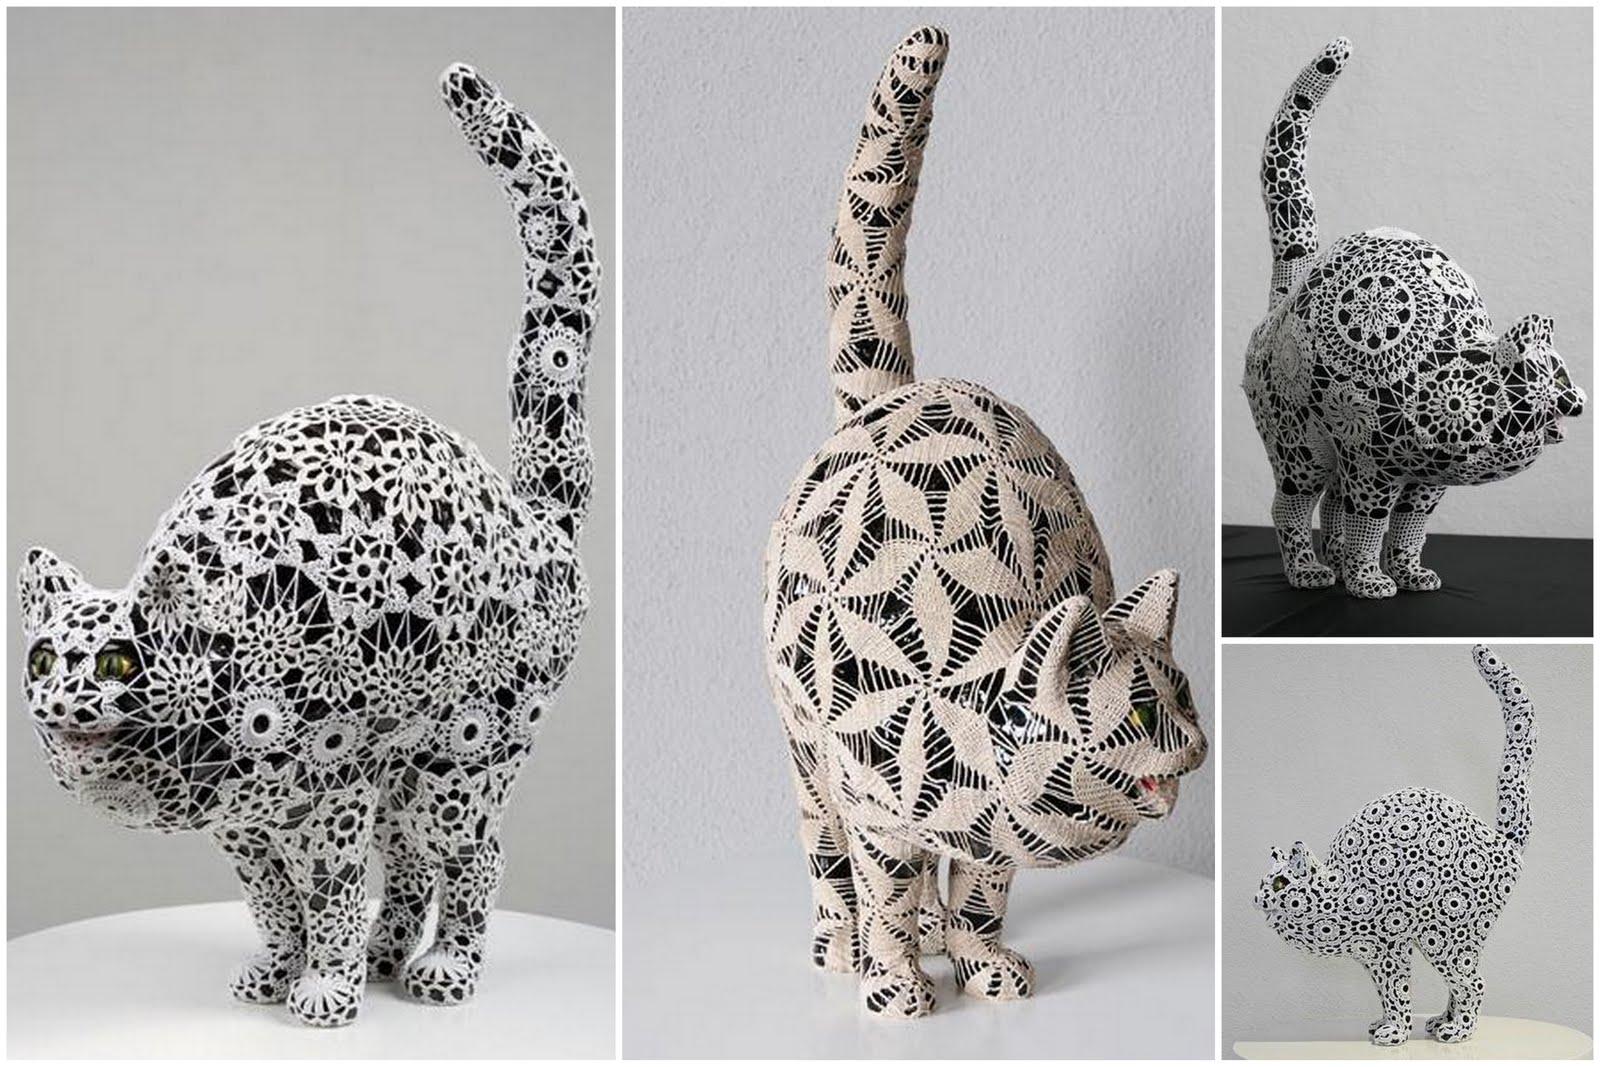 https://74fdc.files.wordpress.com/2012/06/joana-vasconcelos-cats.jpg